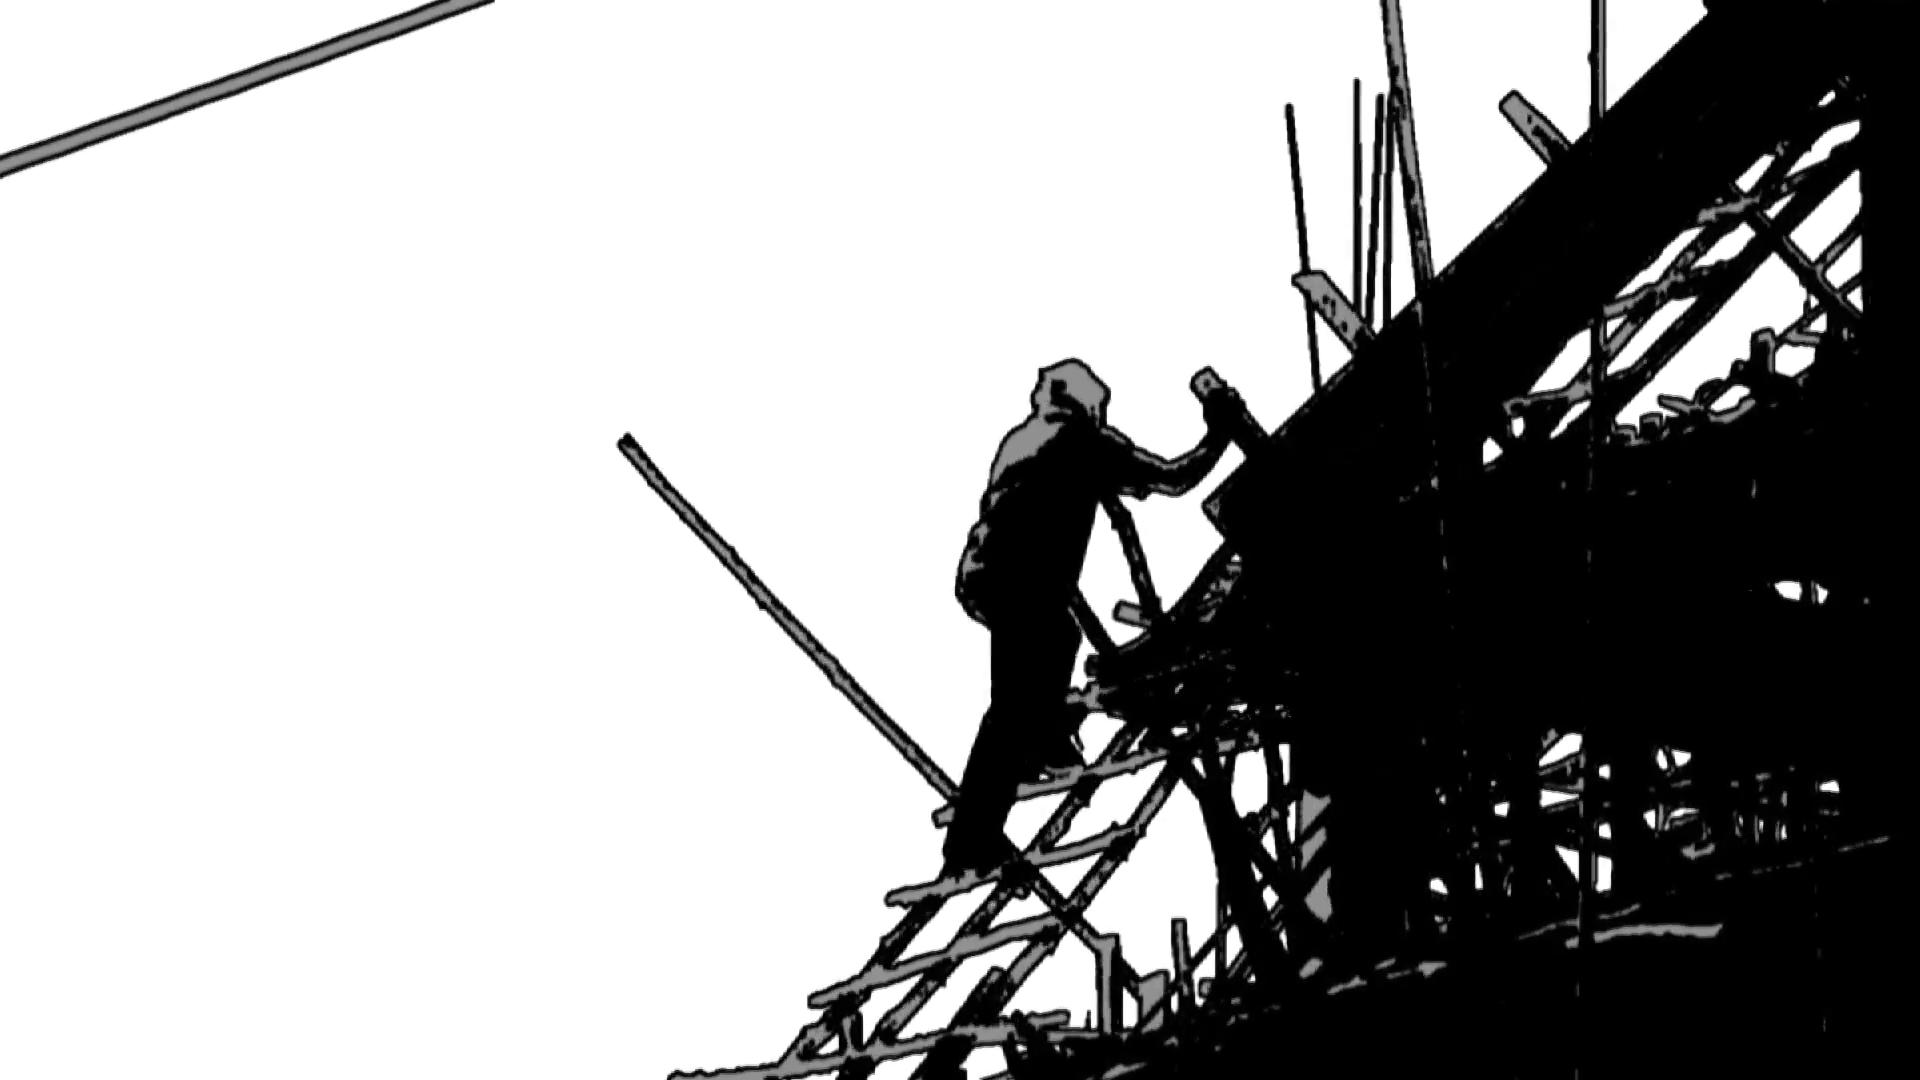 1920x1080 Construction Worker Silhouette Industry Site Building Development